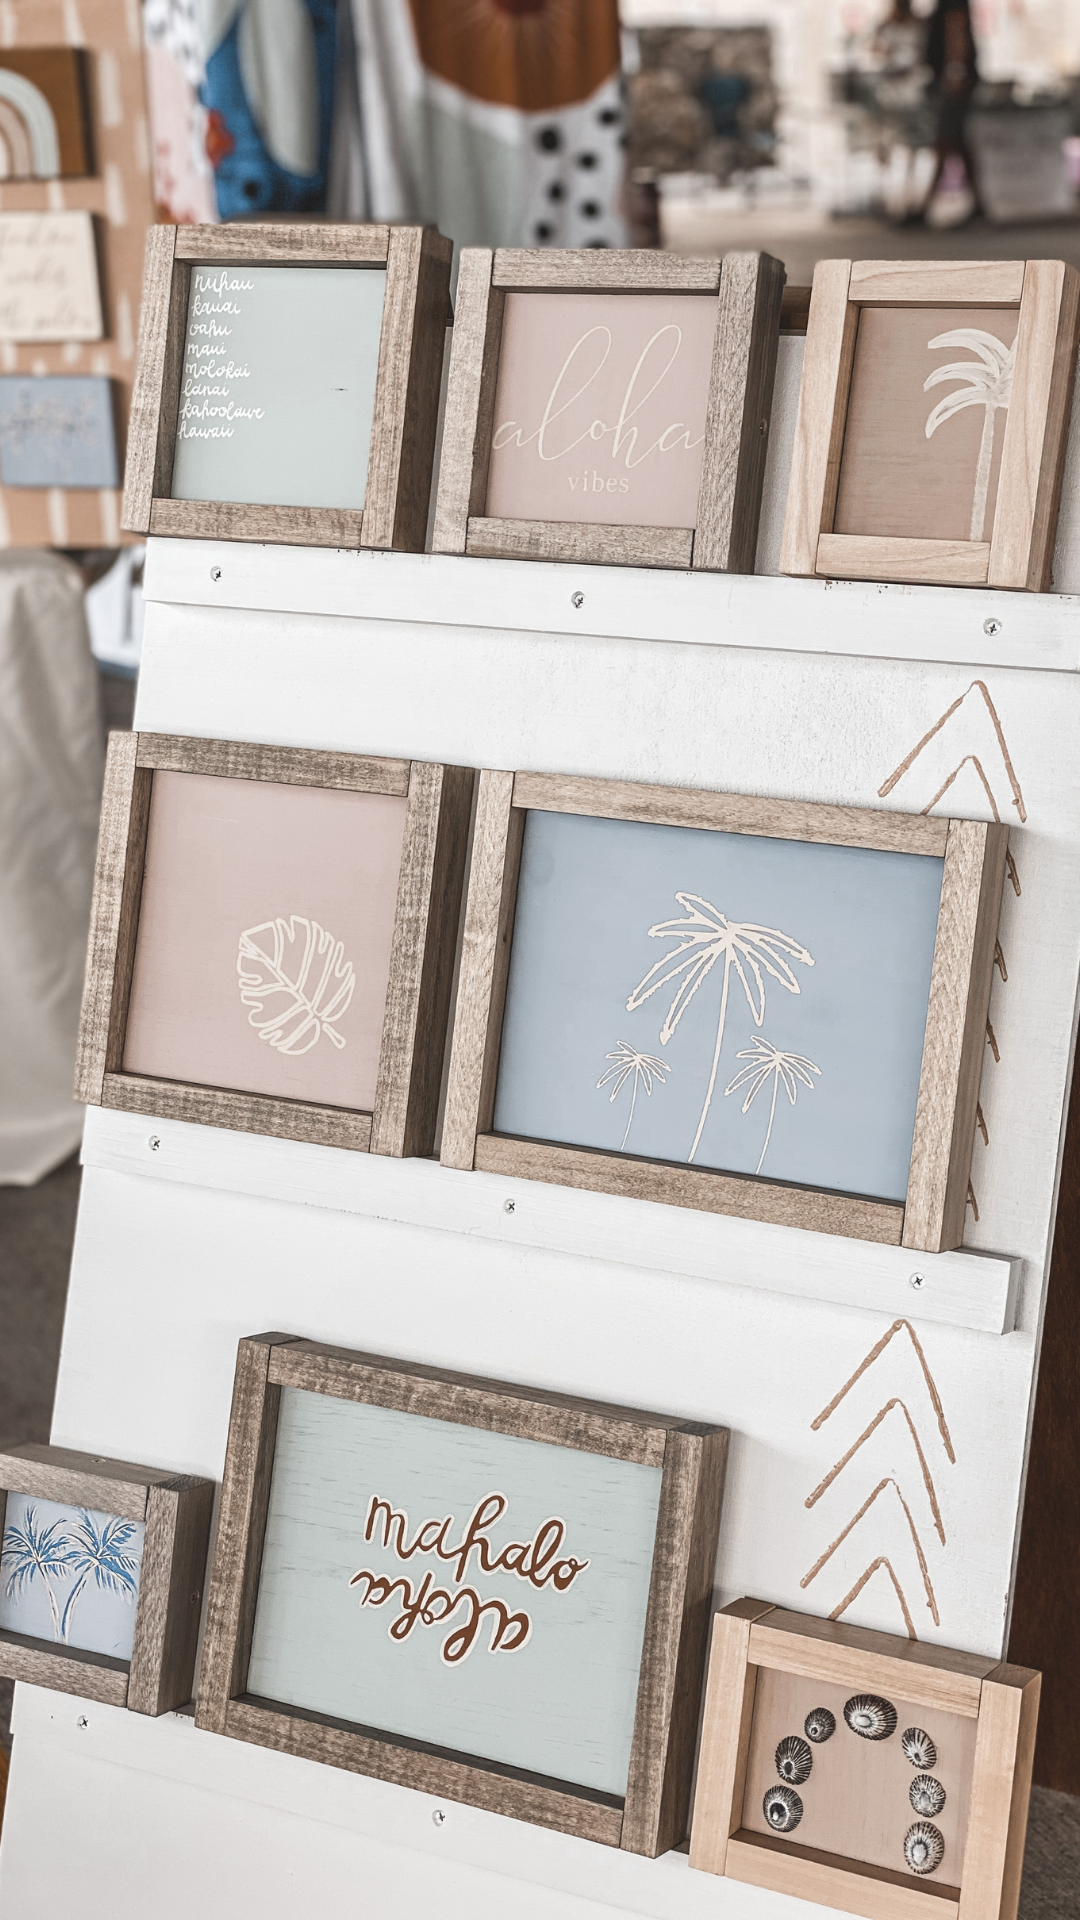 #canva #canvacreations #plantsandsun #instagramstory #minis #shopify #shopifystore #wood #wooden #woodensigns #crochet #crochethook #wallhangings #islanddecor #coastaldecor #beachdecor #homedecor #beachhousedecor #beachhomeinterior #islandhomedecor #coastal #beachstyle #coastalstyle #islandstyle #shopsmall #supportsmall #shoplocal #supportlocal #hawaii #hawaiismallbusiness #smallbusiness #smallbusinessowner #oahu #oahuhawaii #onislandtime #aloha #palm #minimalistpalm #sunrise #spreadthealoha